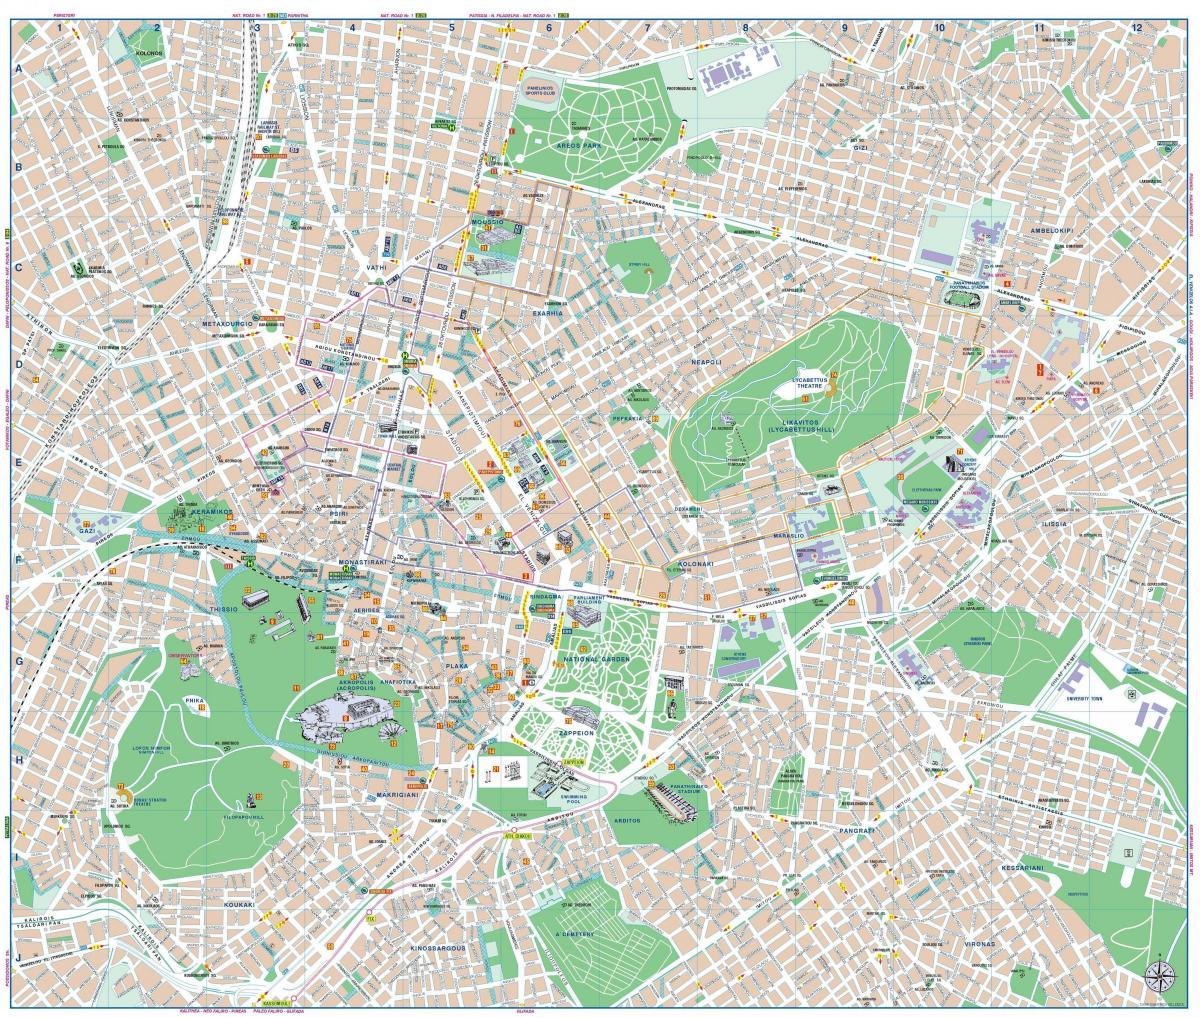 Karta Aten Grekland.Centrala Aten Karta Aten Grekland City Center Karta Grekland